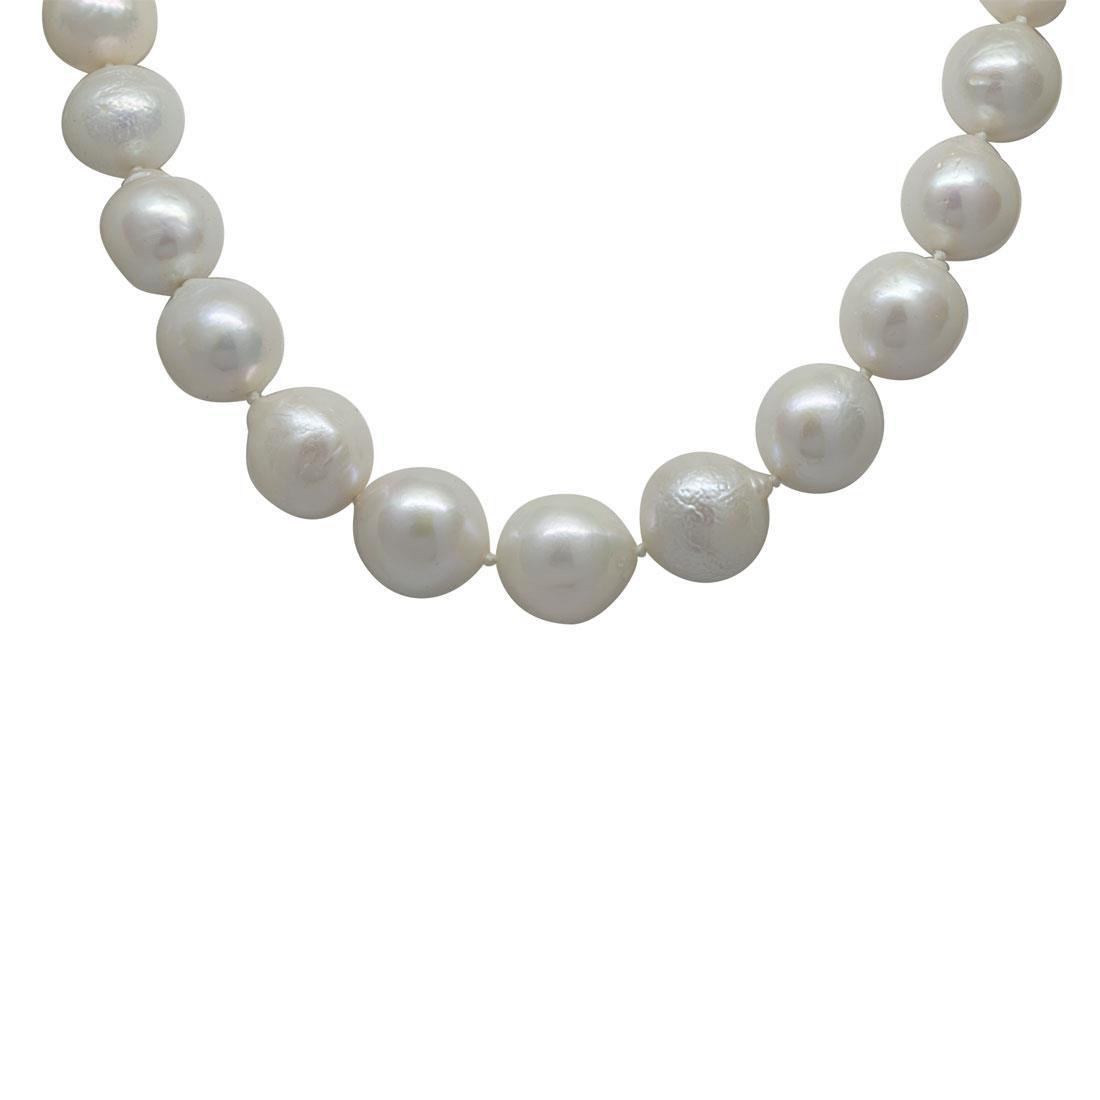 Collana filo di perle - RIVIK